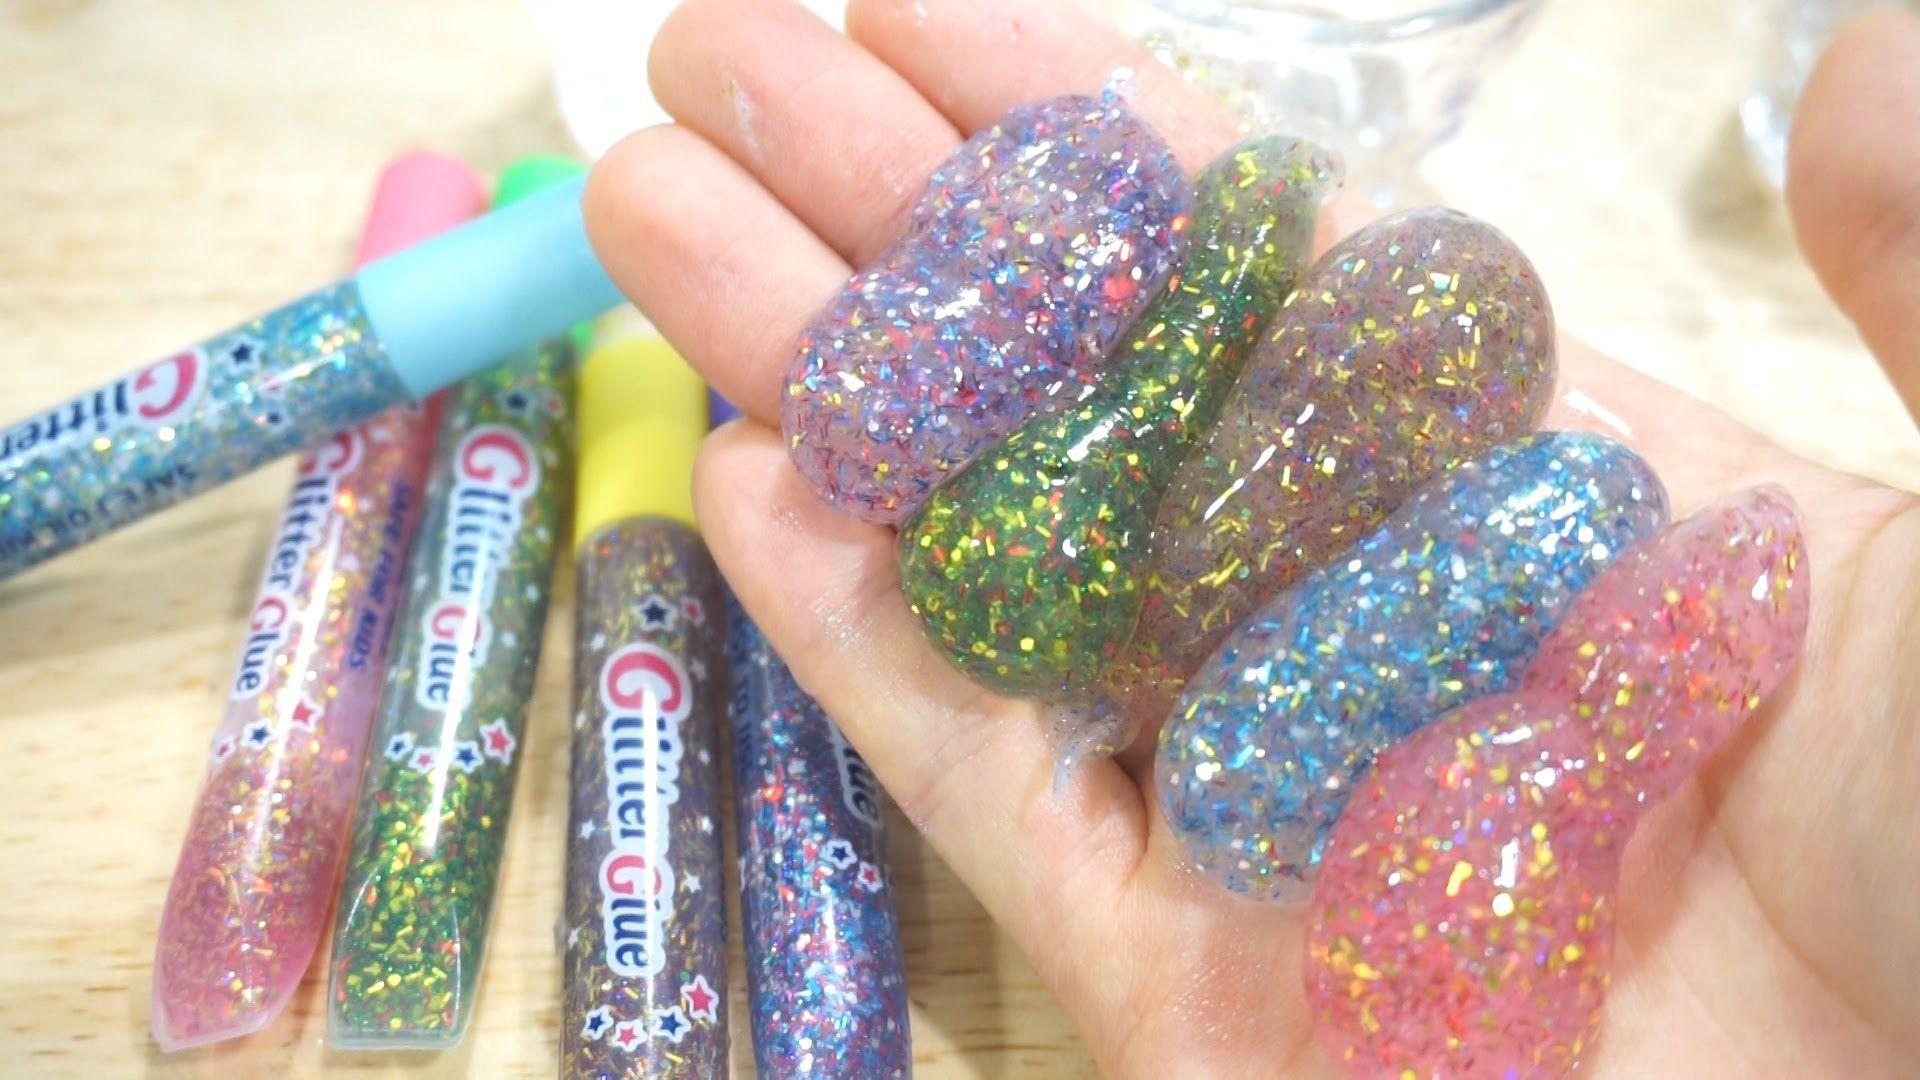 Diy en espaol diy cmo hacer glitter ooho slime juguetes diy en espaol diy cmo hacer glitter ooho slime juguetes mgicos pl ccuart Images